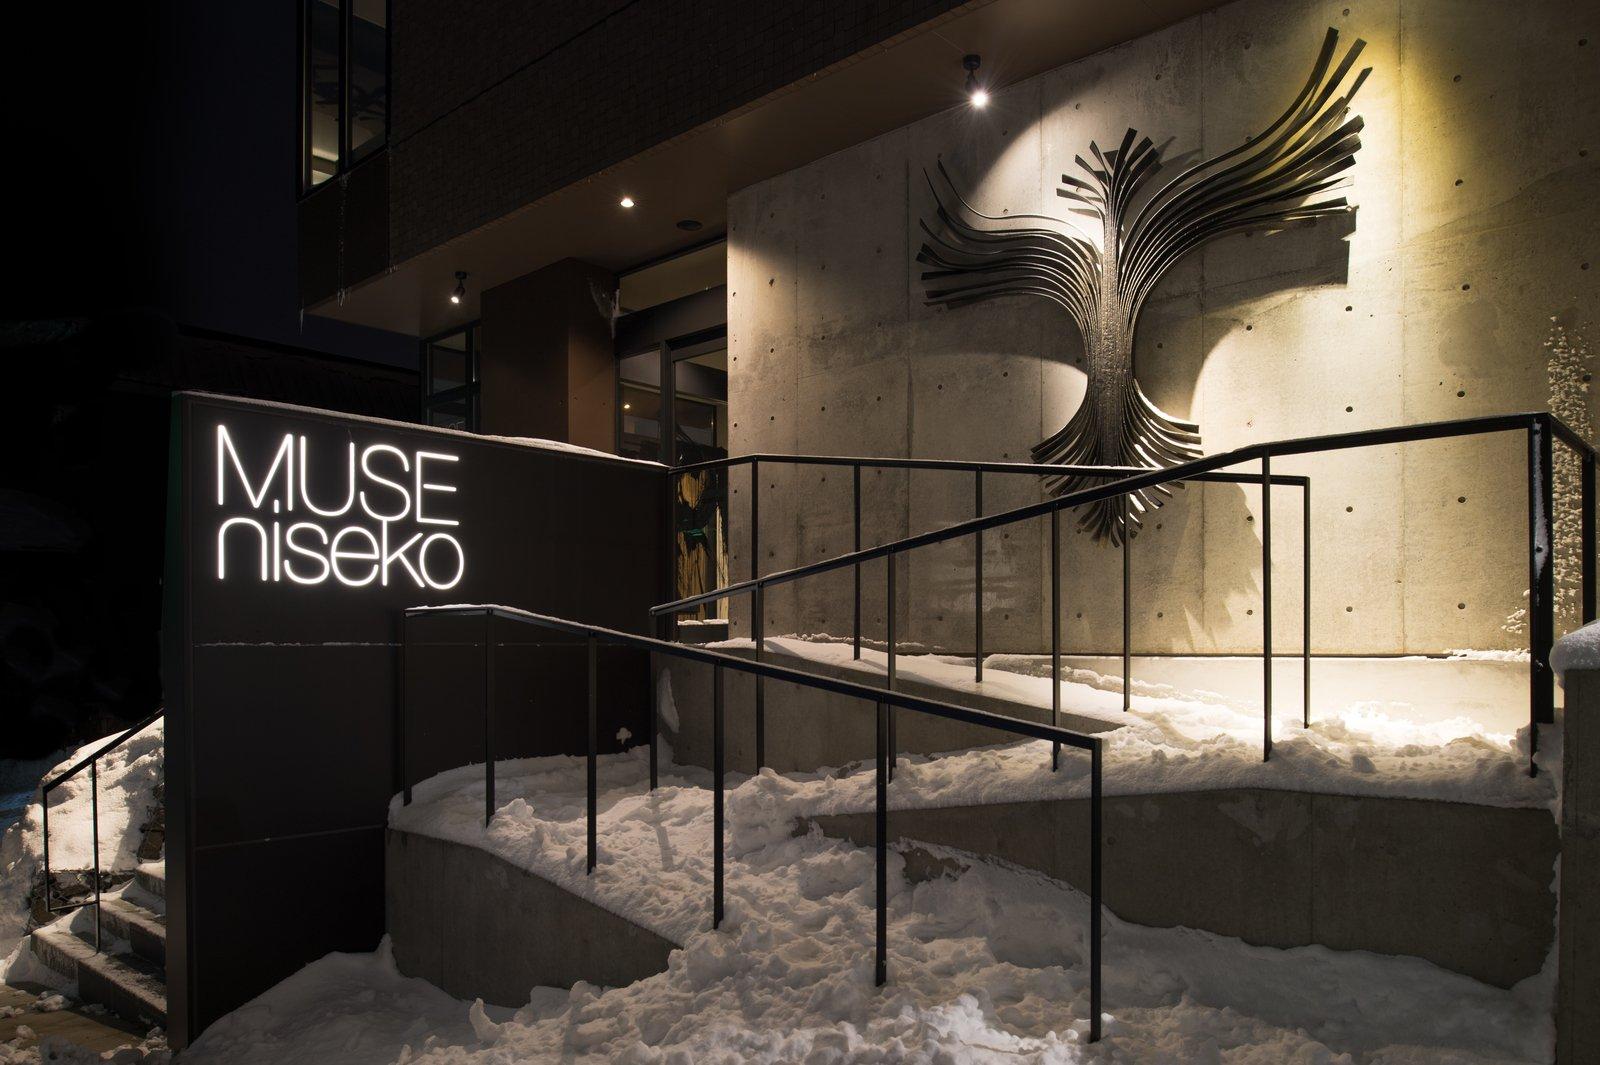 Muse niseko entrance art large